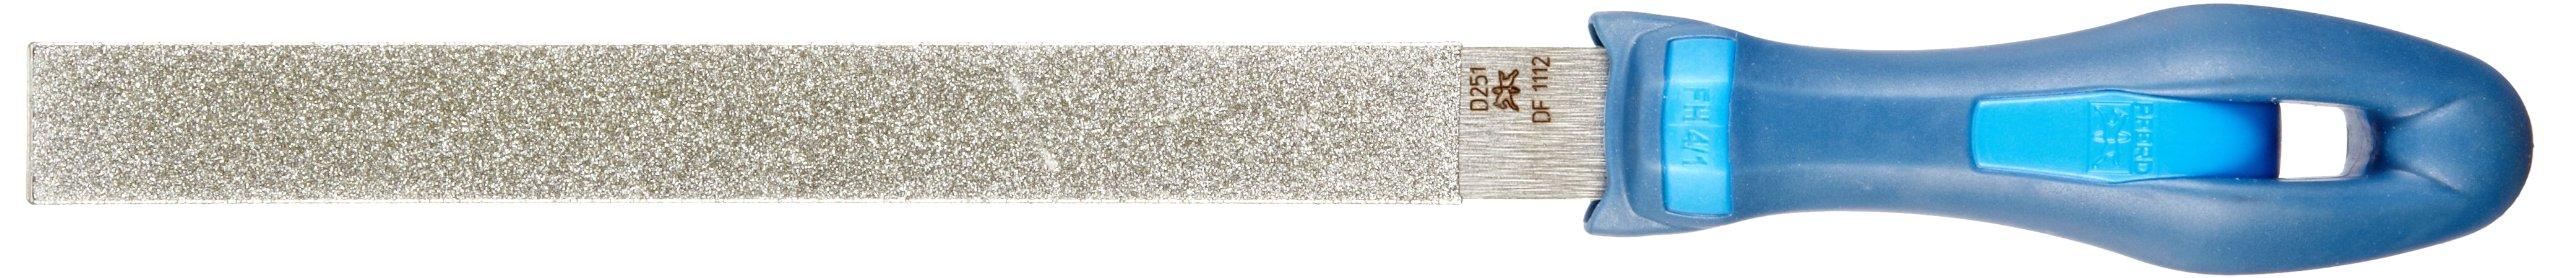 PFERD Machinist Hand File, Diamond Grit, Rectangular, Very Coarse, 8'' Length by Pferd